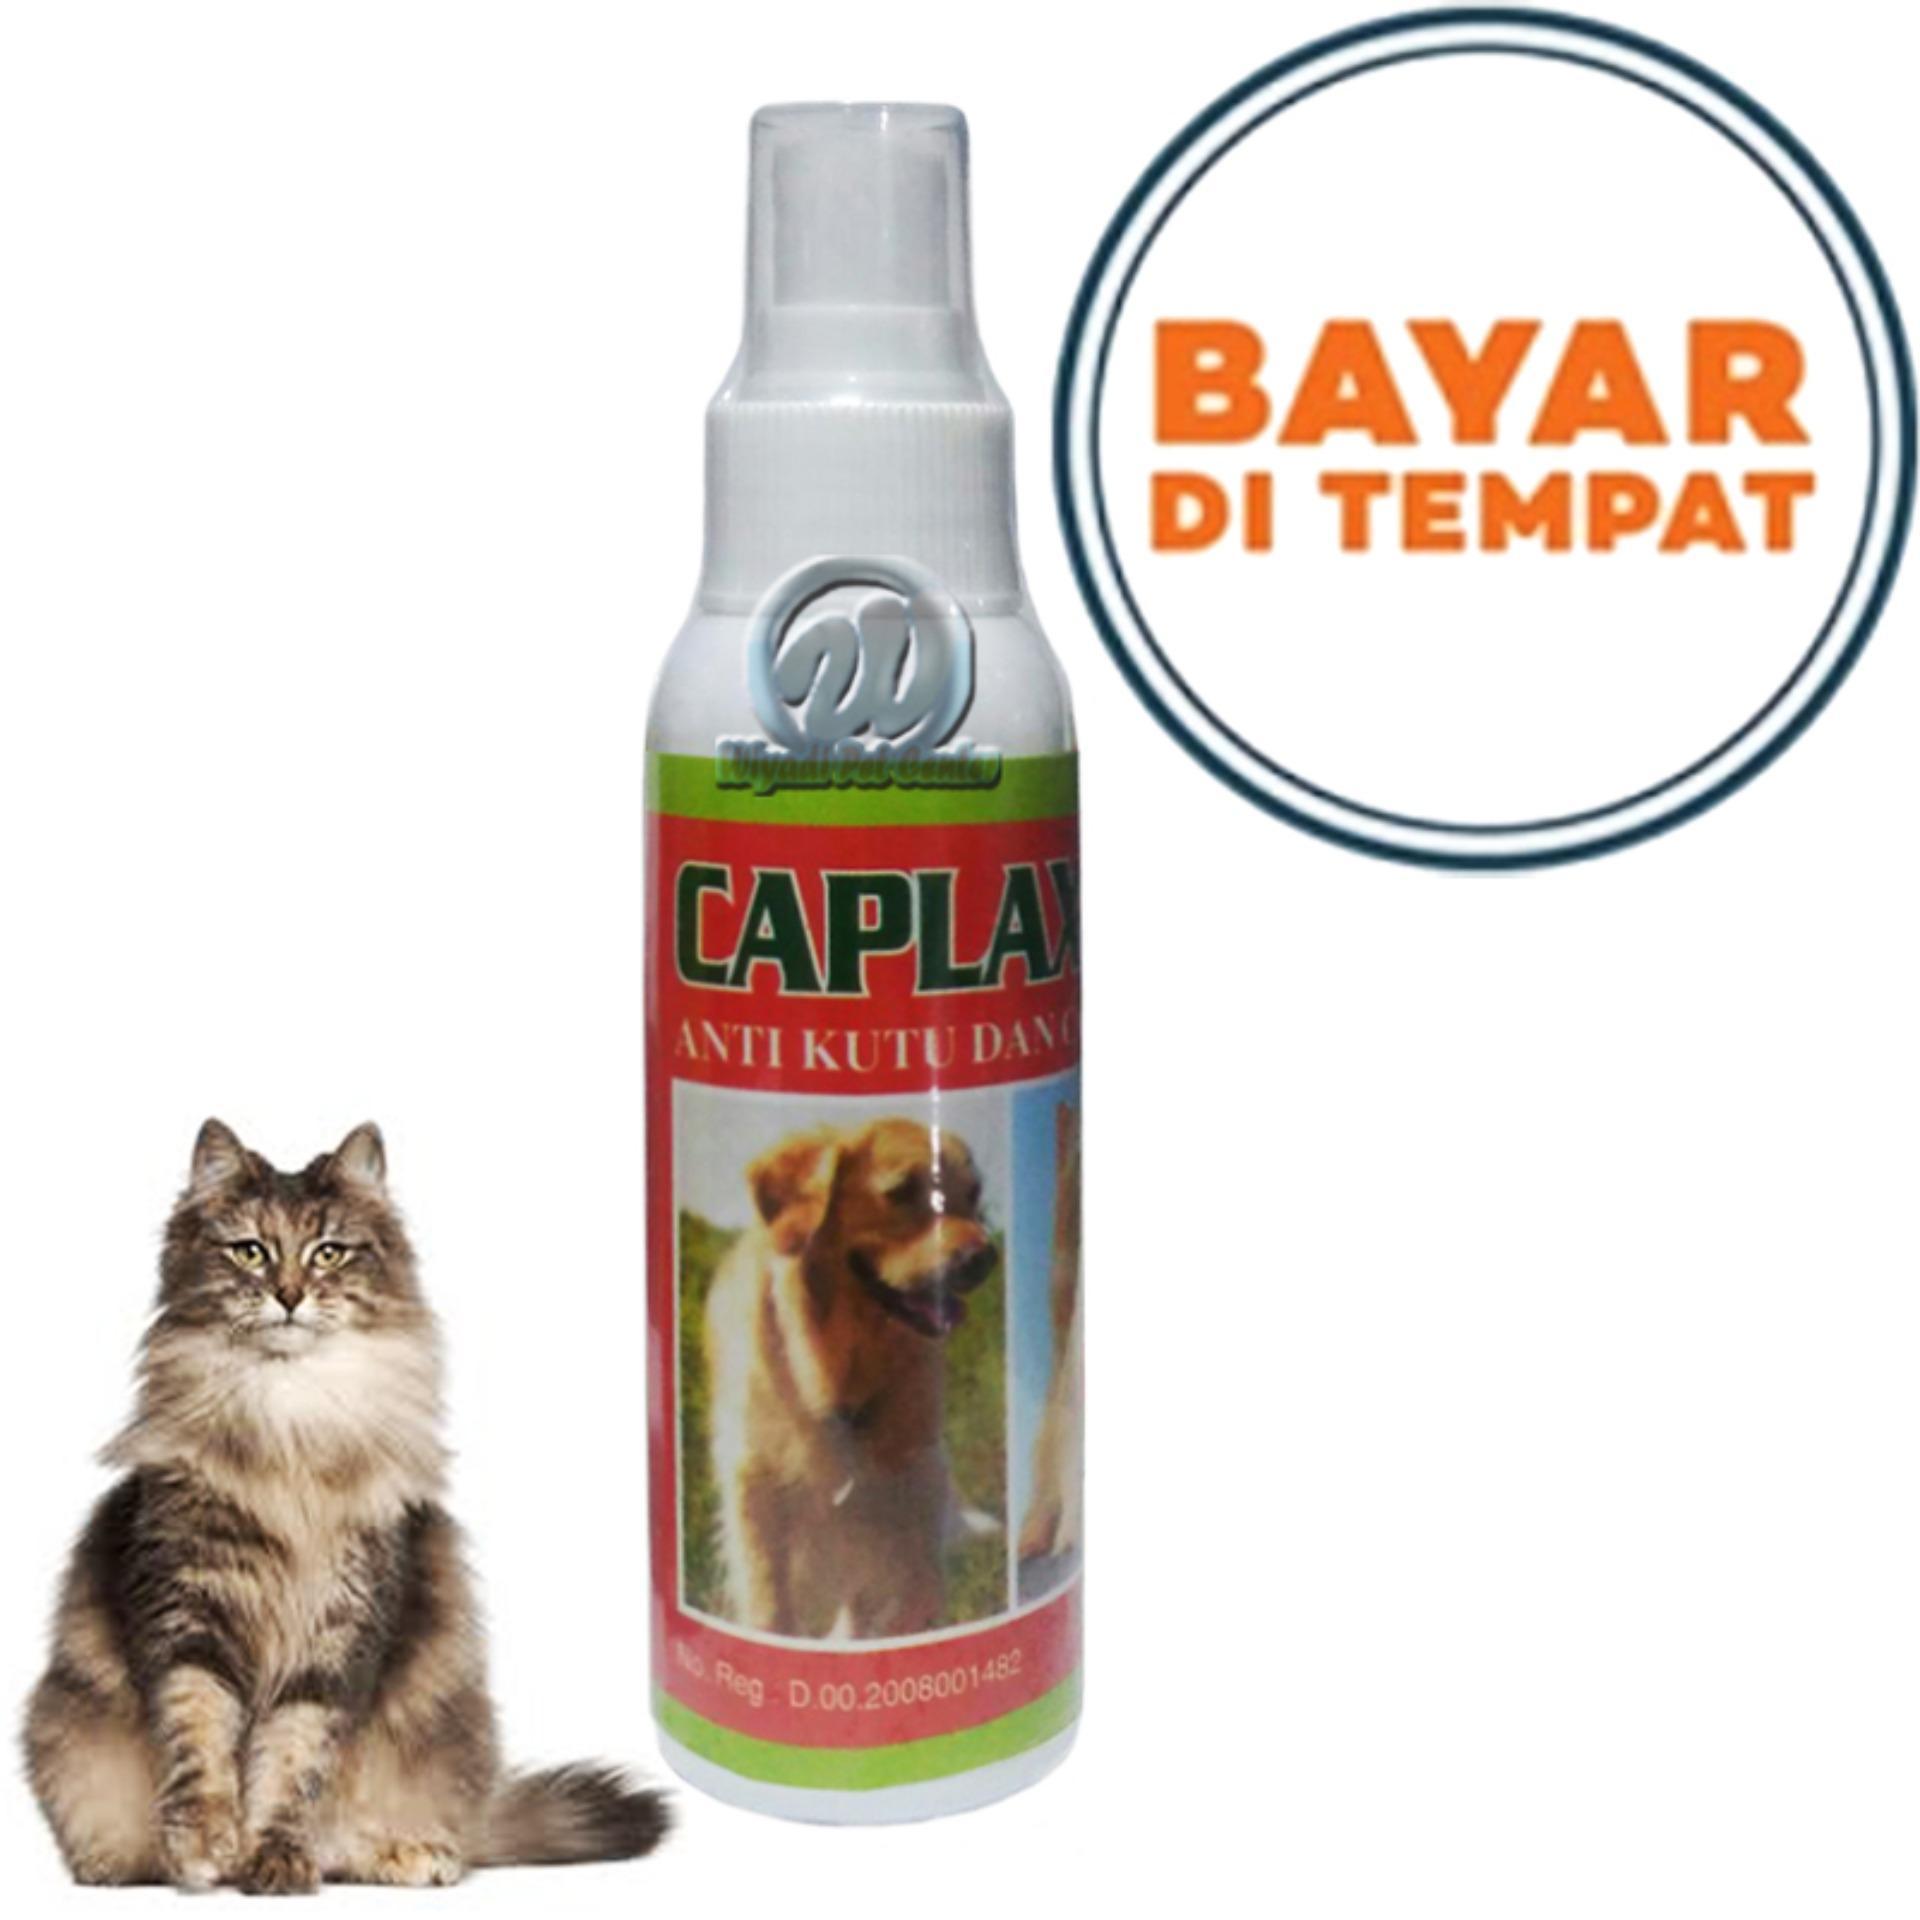 Caplak Sprey Obat Pembasmi Kutu Kucing Caplax Anjing By Lucky Petshop